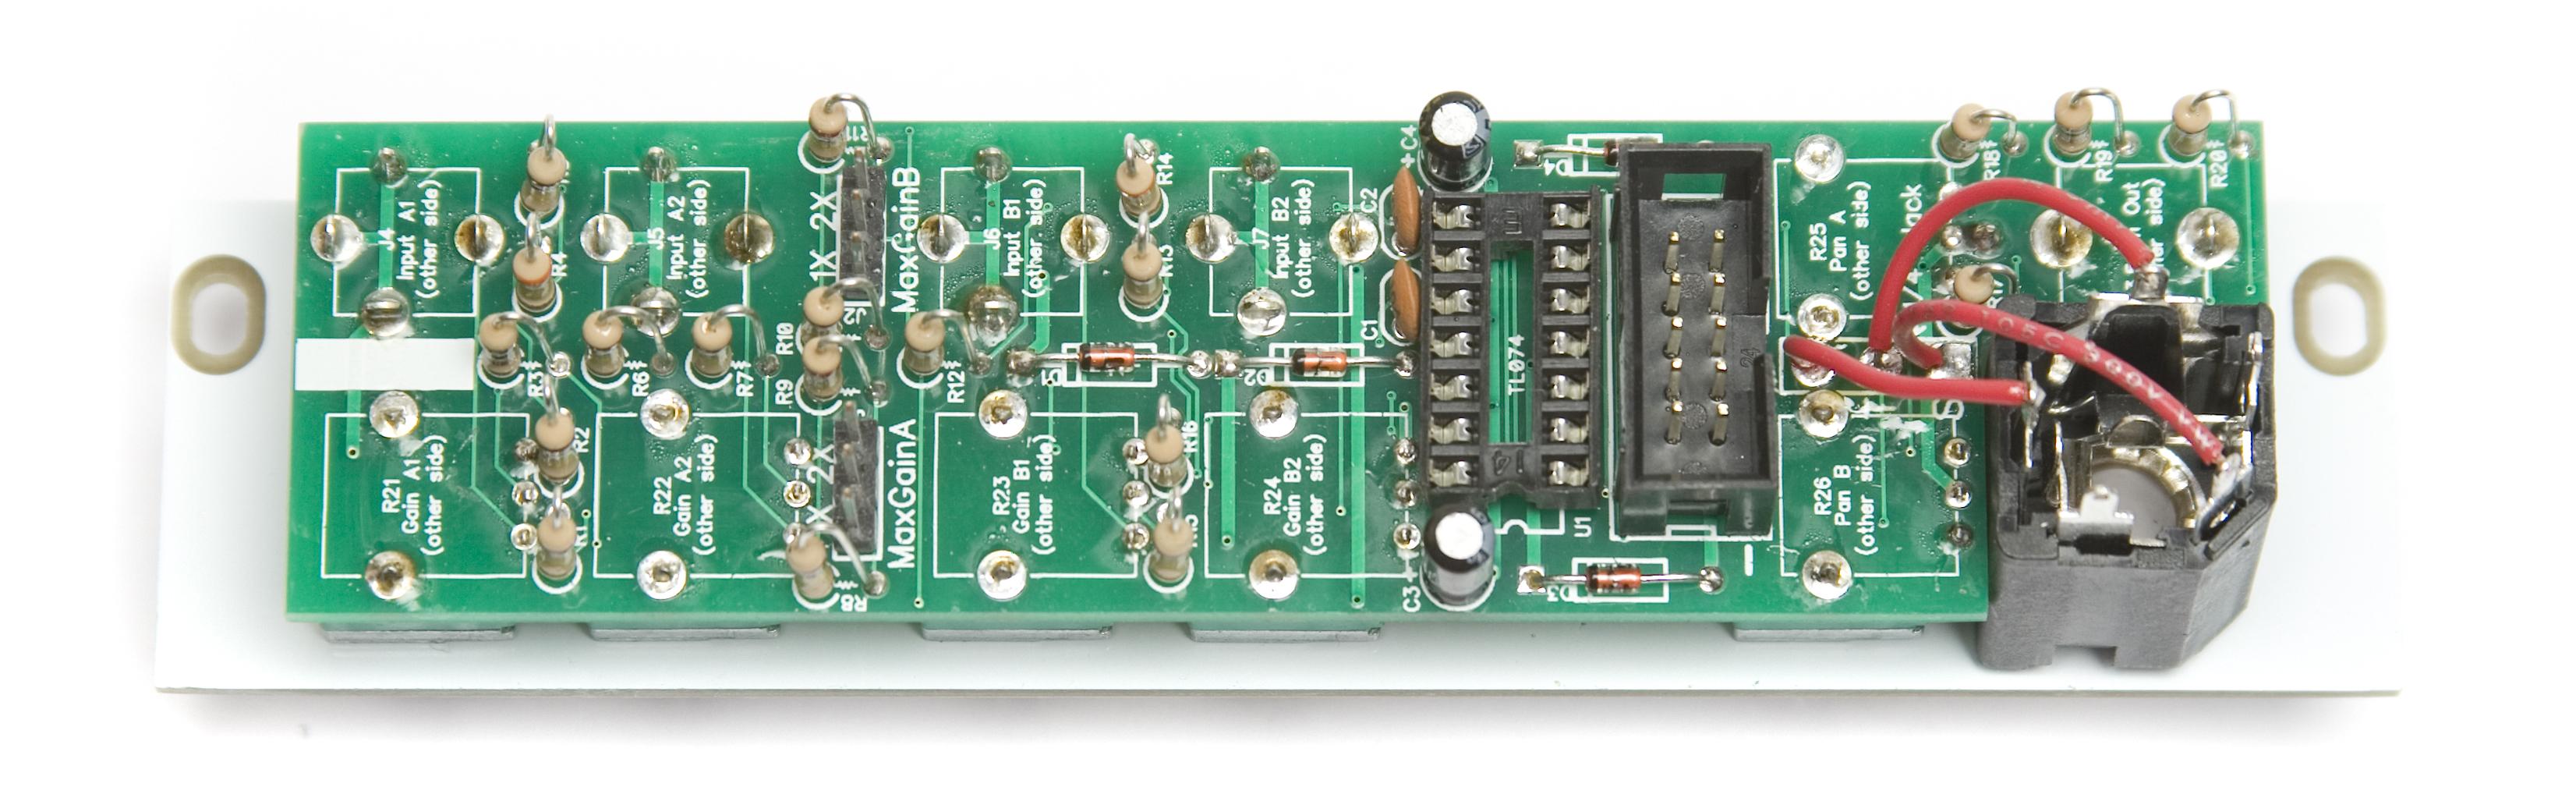 1 4 Jack Wiring To Circuit Board - Data Wiring Diagrams •